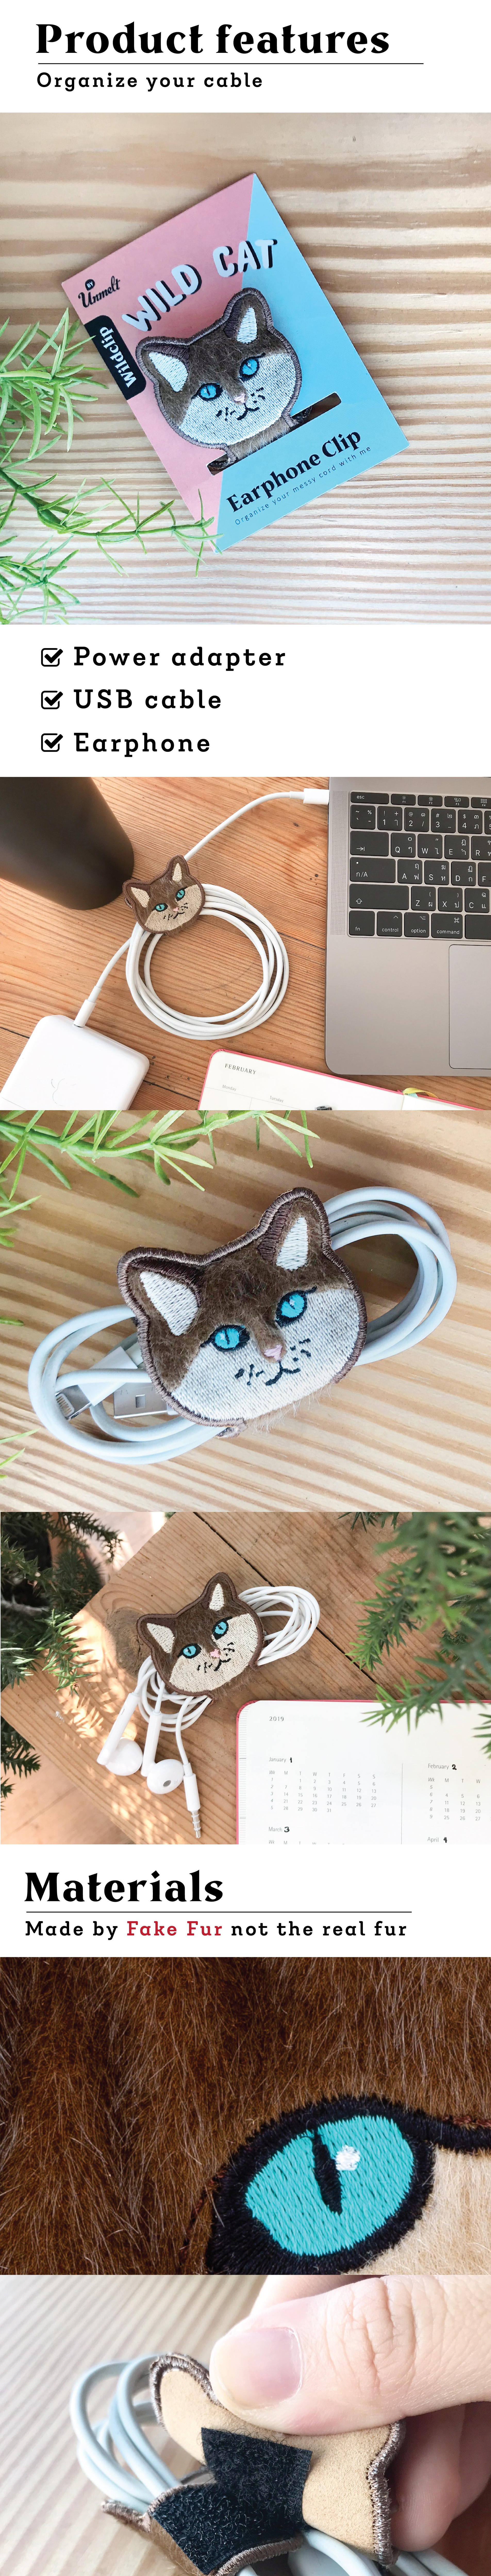 wildcat, unmelt,wildclip,cat,catlover,catitems,animalitems,cable organiser,cablekeeper